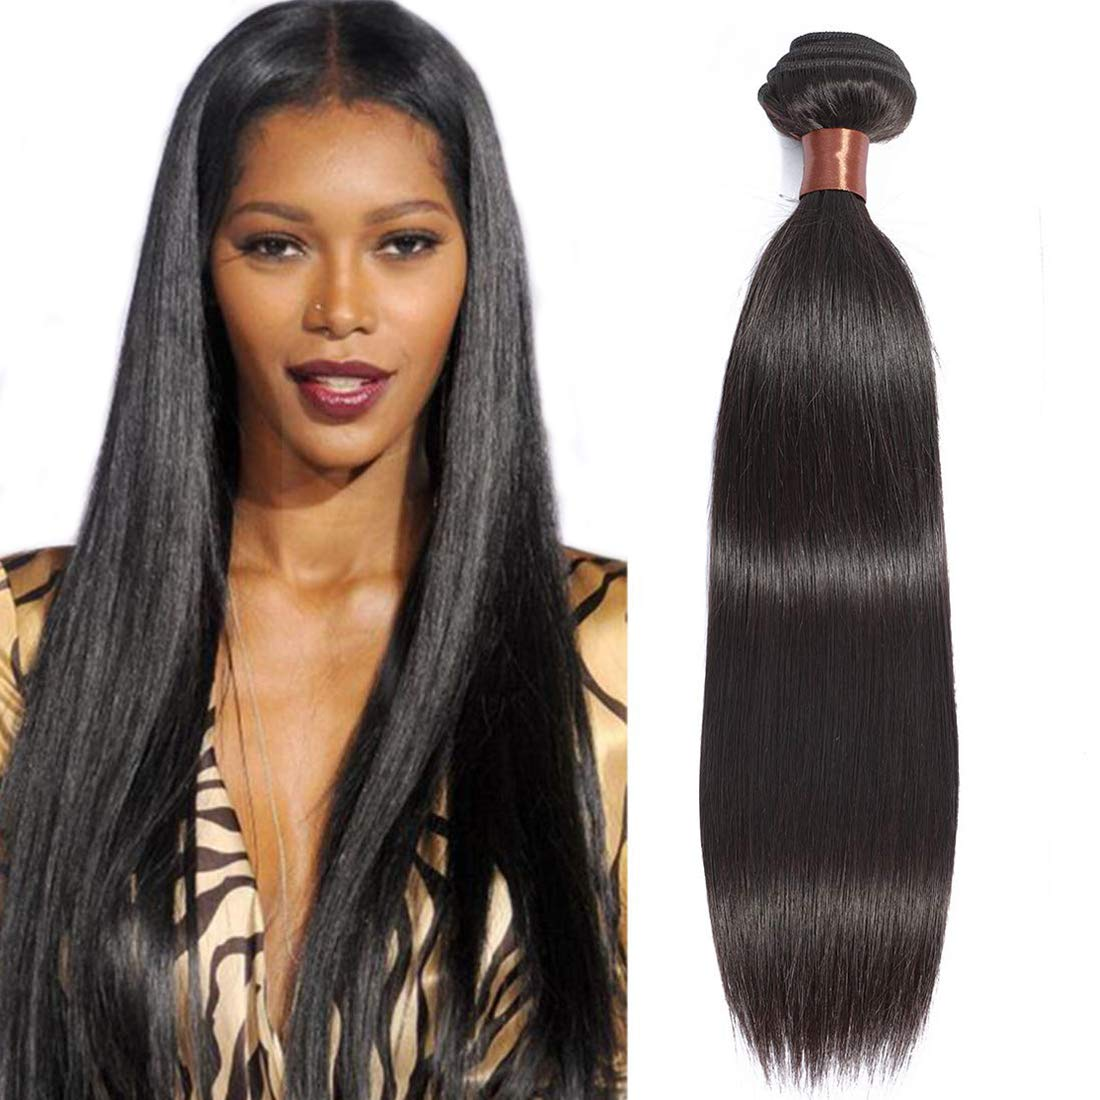 ANGIE QUEEN Peruvian Virgin Hair Straight Bundle Ranking TOP4 Tulsa Mall inch 28 One 100